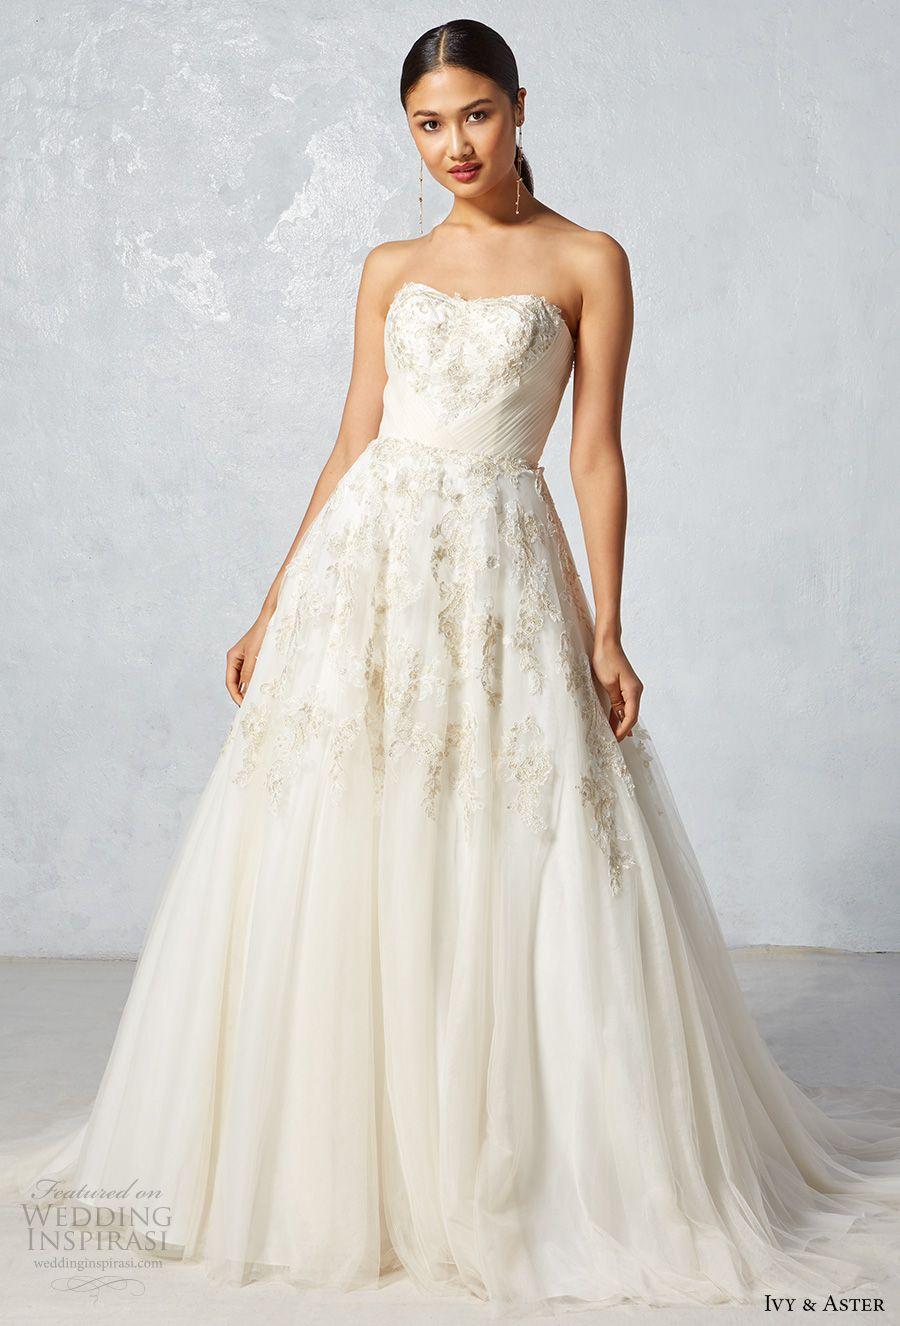 Lightweight wedding dresses  Pin by MARIANA VERNOCHI on futuro  Pinterest